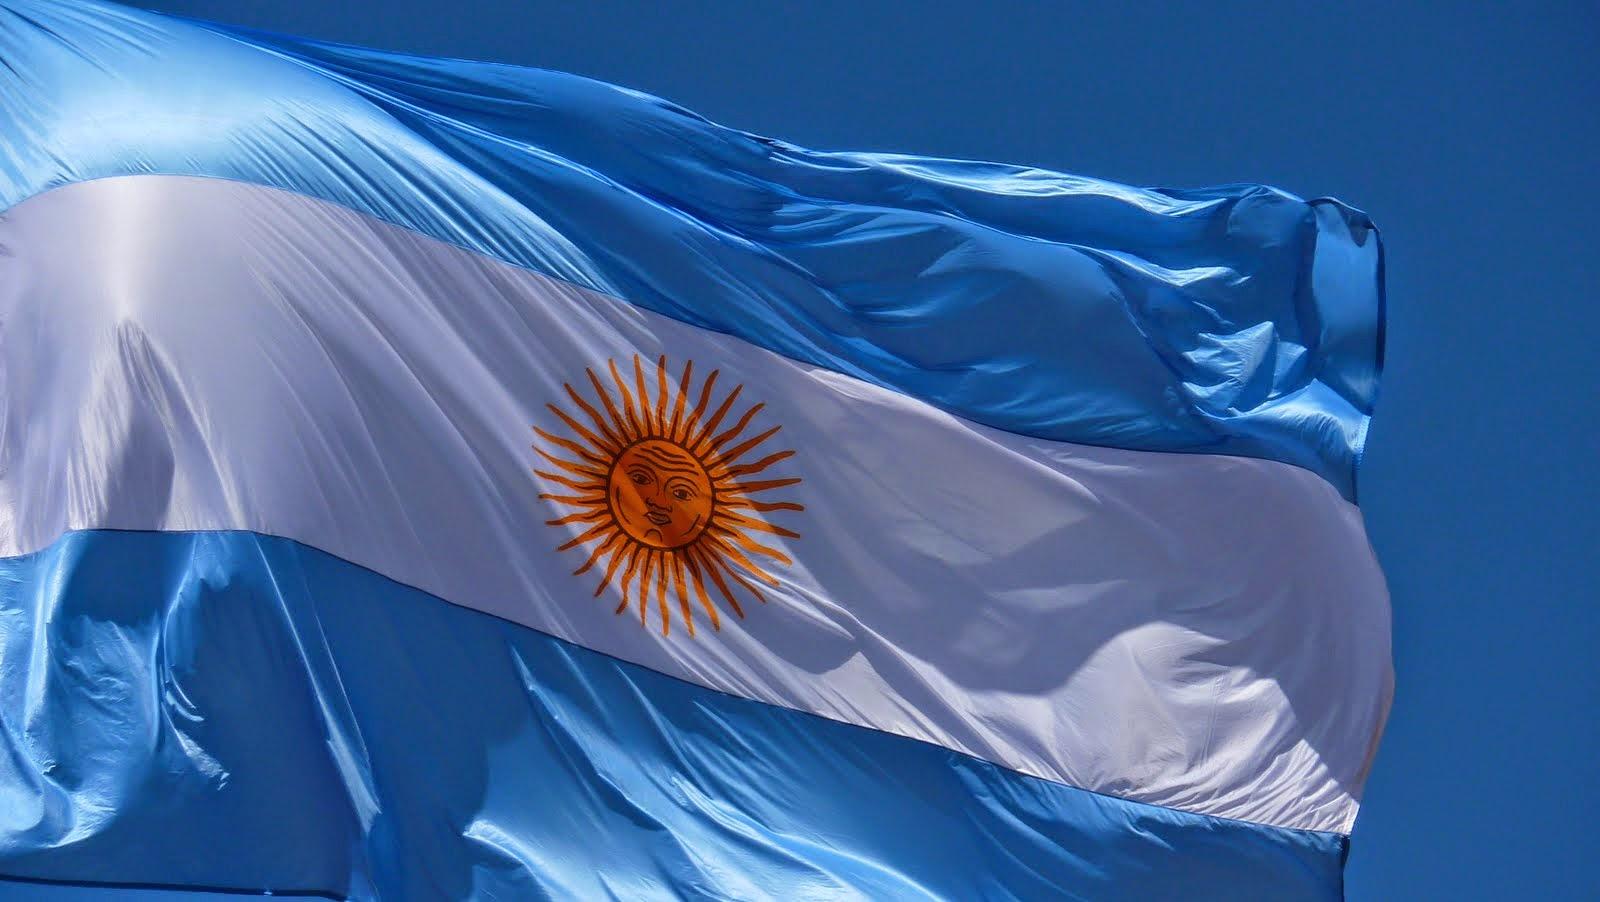 хорошему аргентина флаг фото стоит